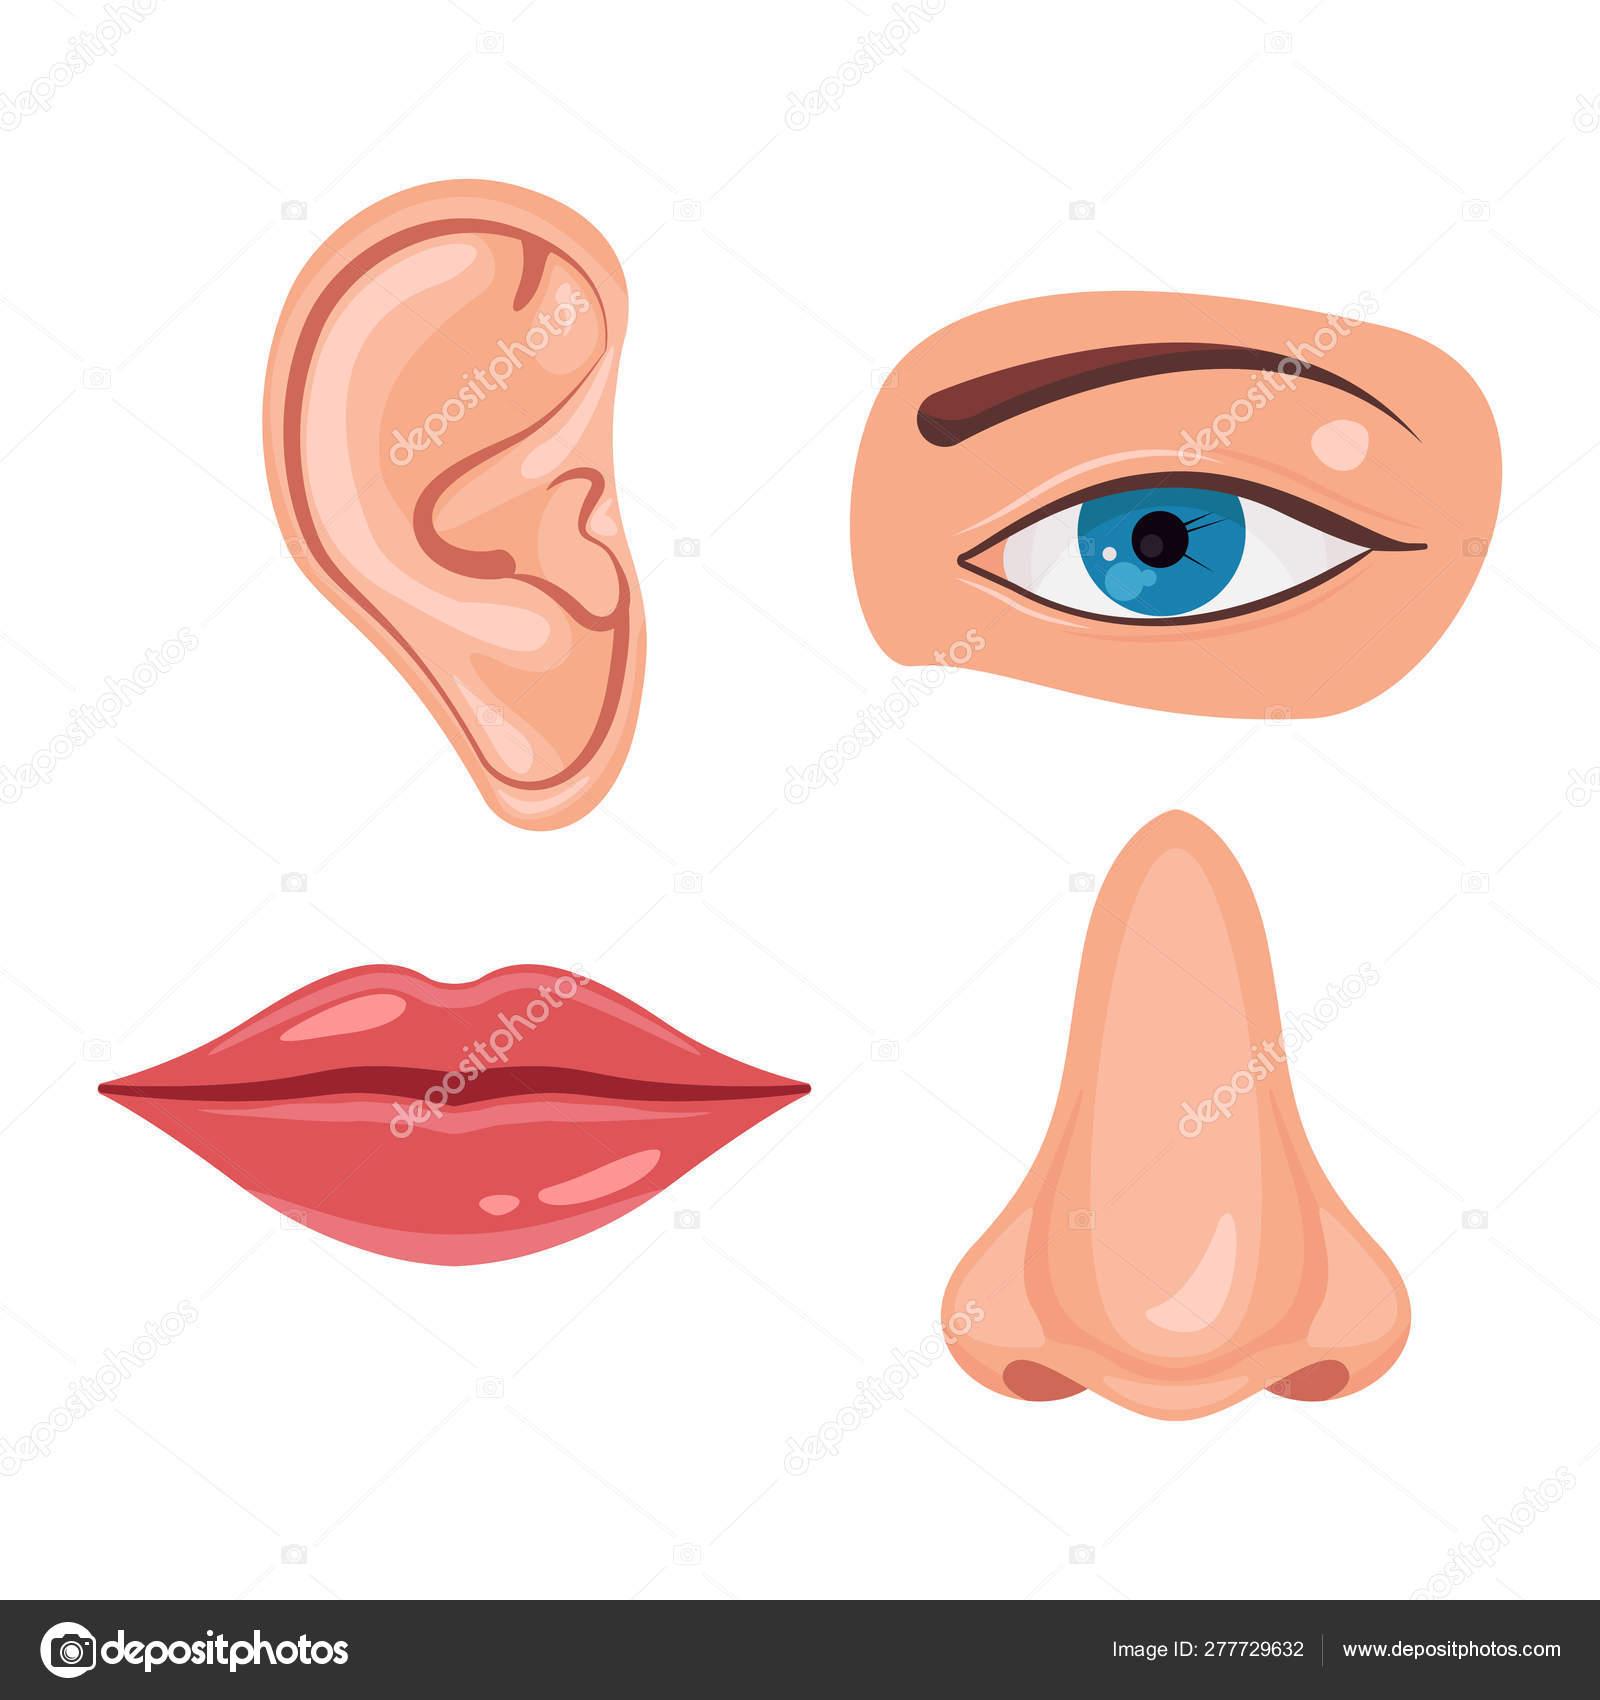 нам должны картинки рот нос глаз уход галерея канады